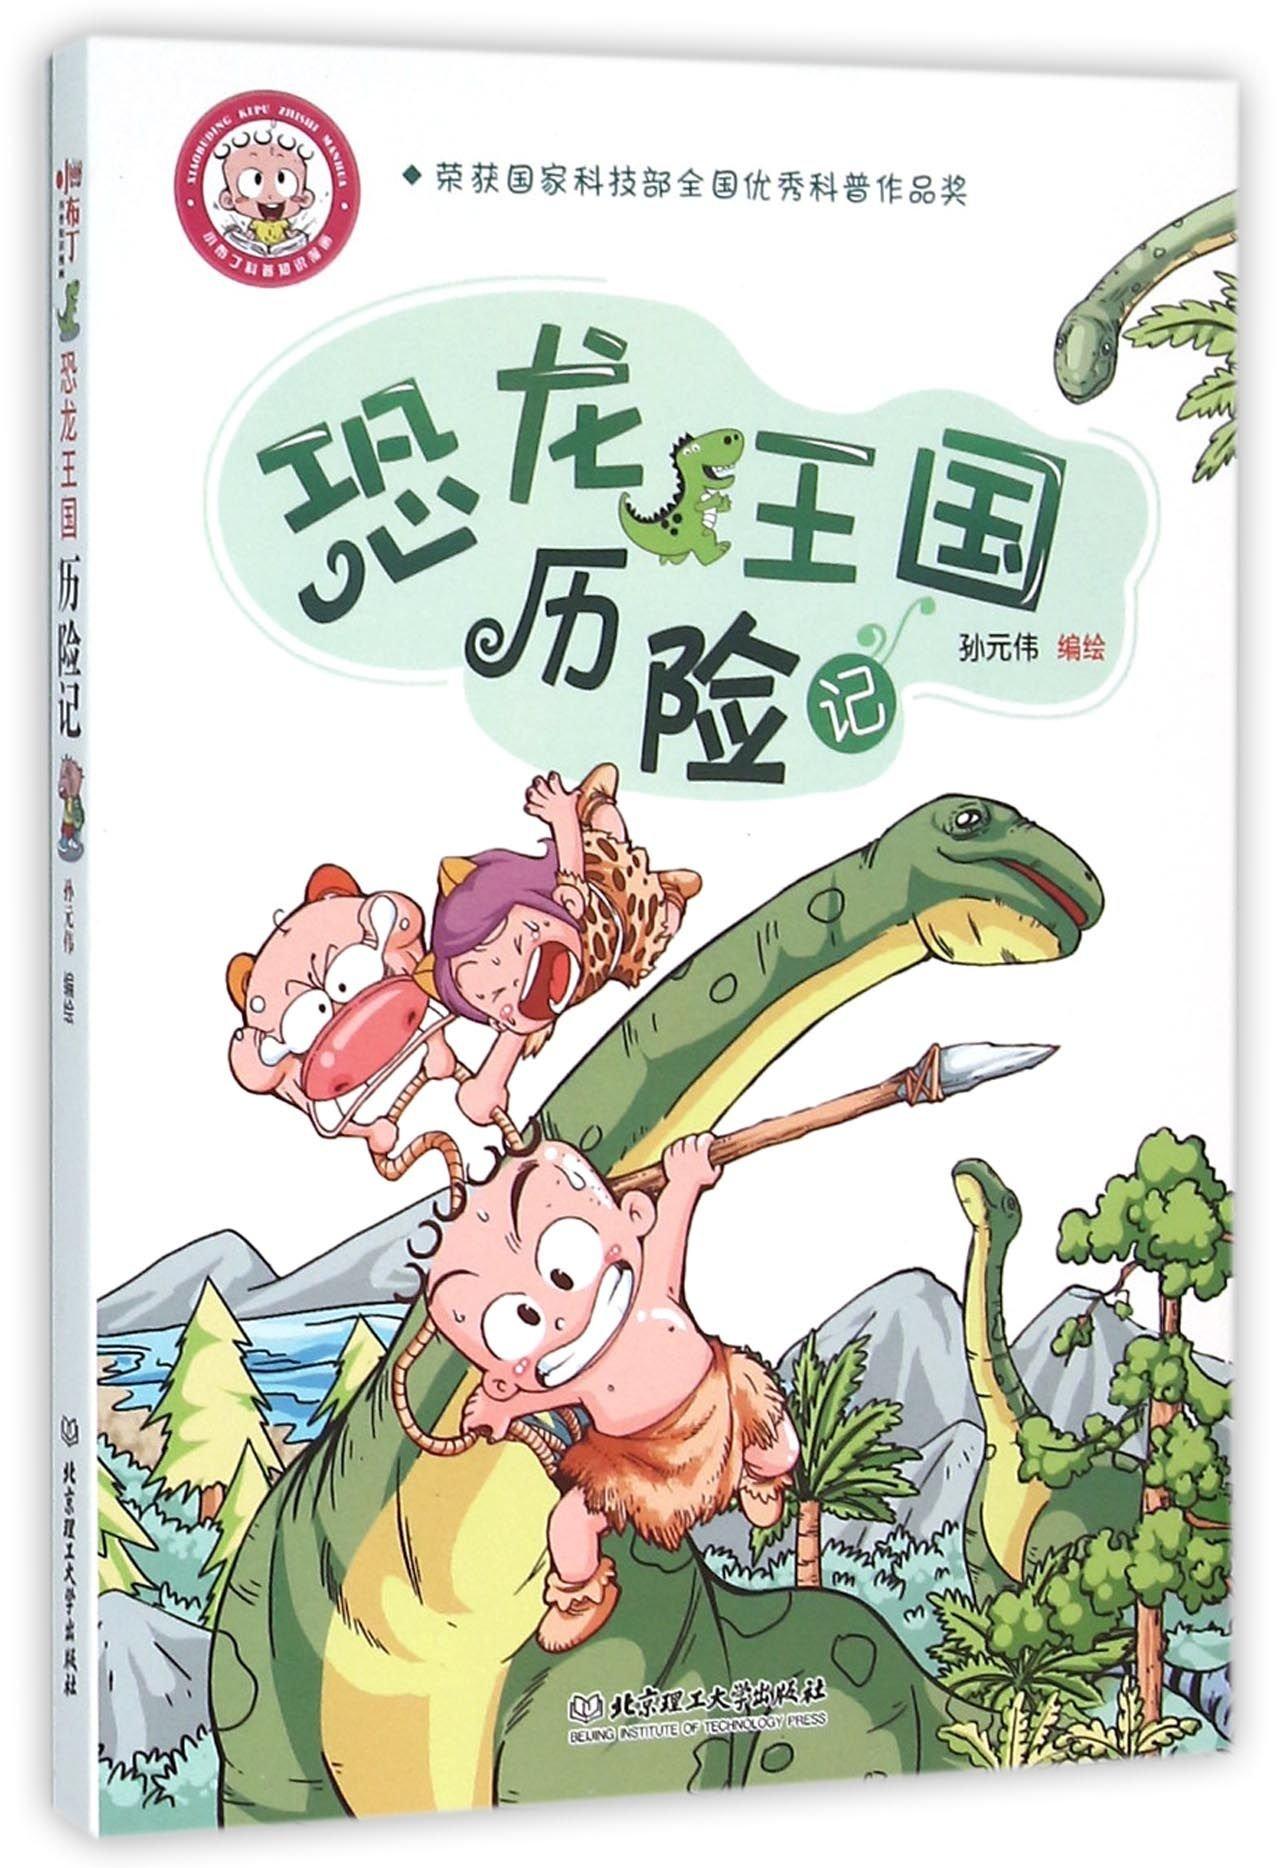 Adventure in Dinosaur Kingdom (Little Pudding Popular Science Cartoon) (Chinese Edition) PDF